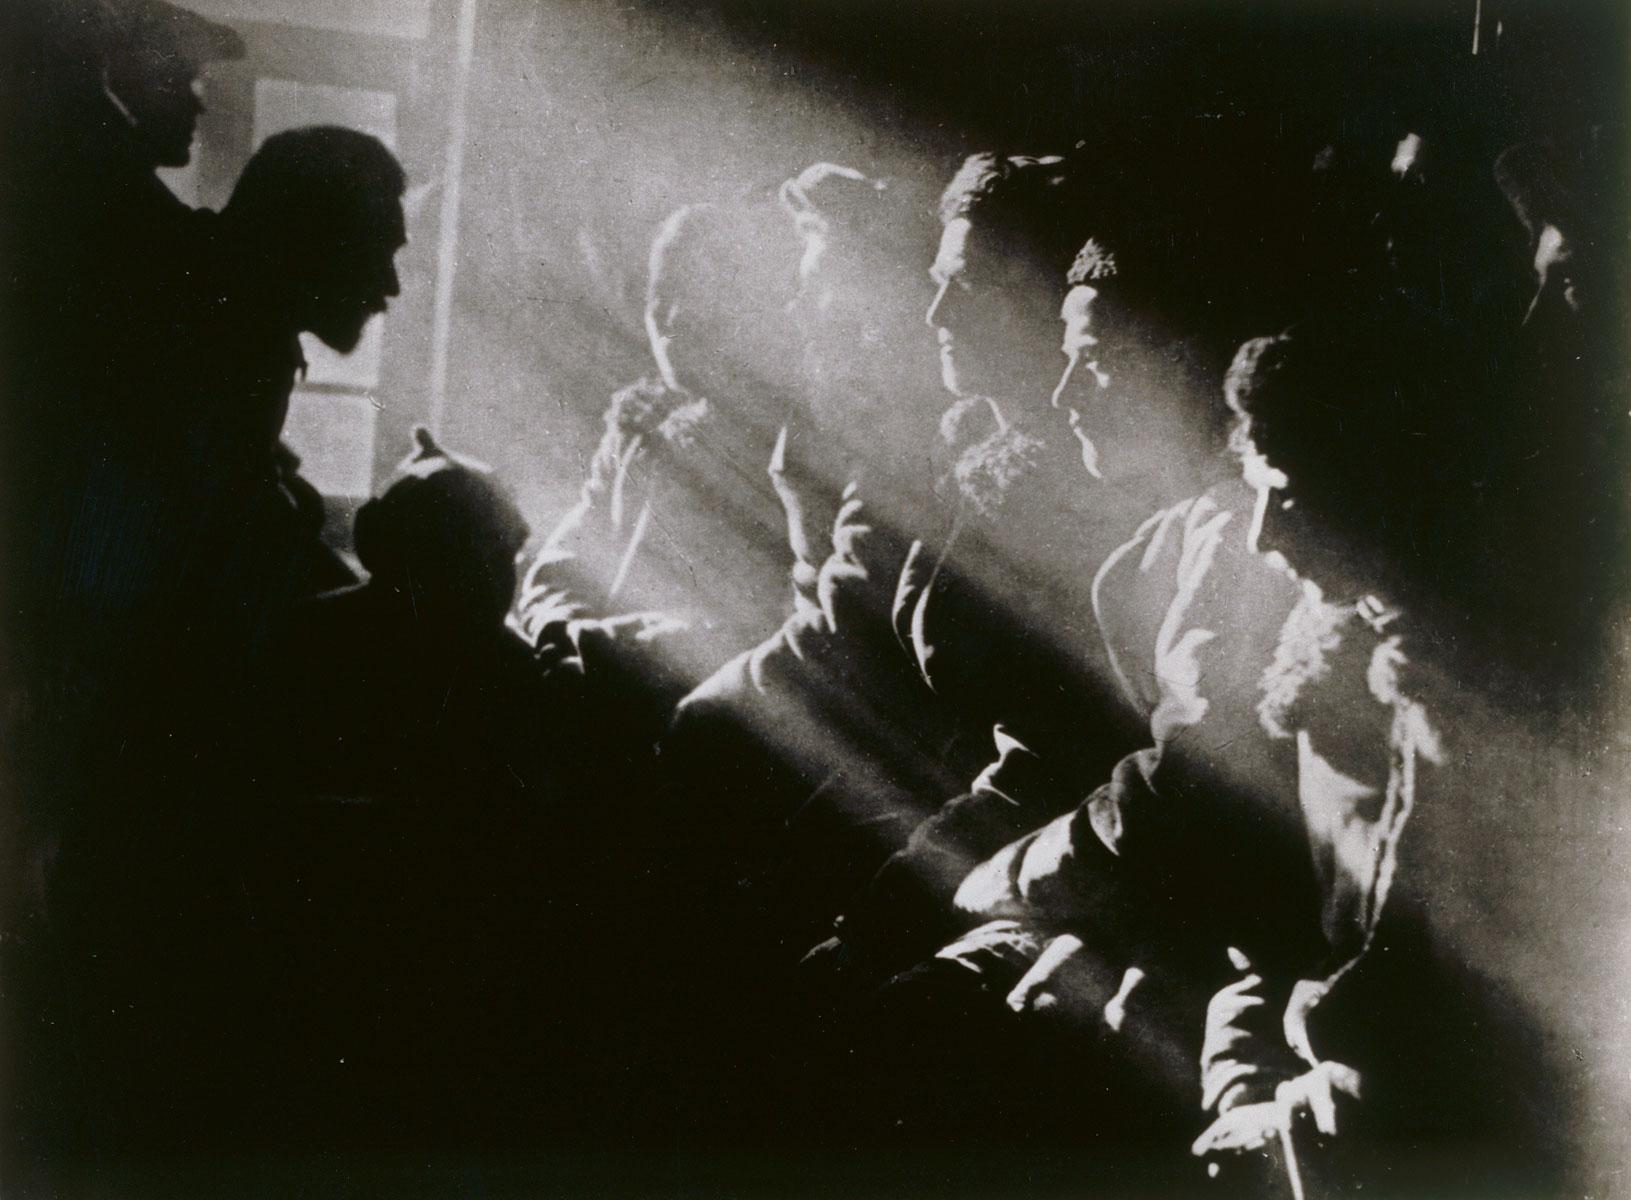 Georgij Anatol'ewitsch Sel'ma, Versammlung der Kolchose in Tula, 1929